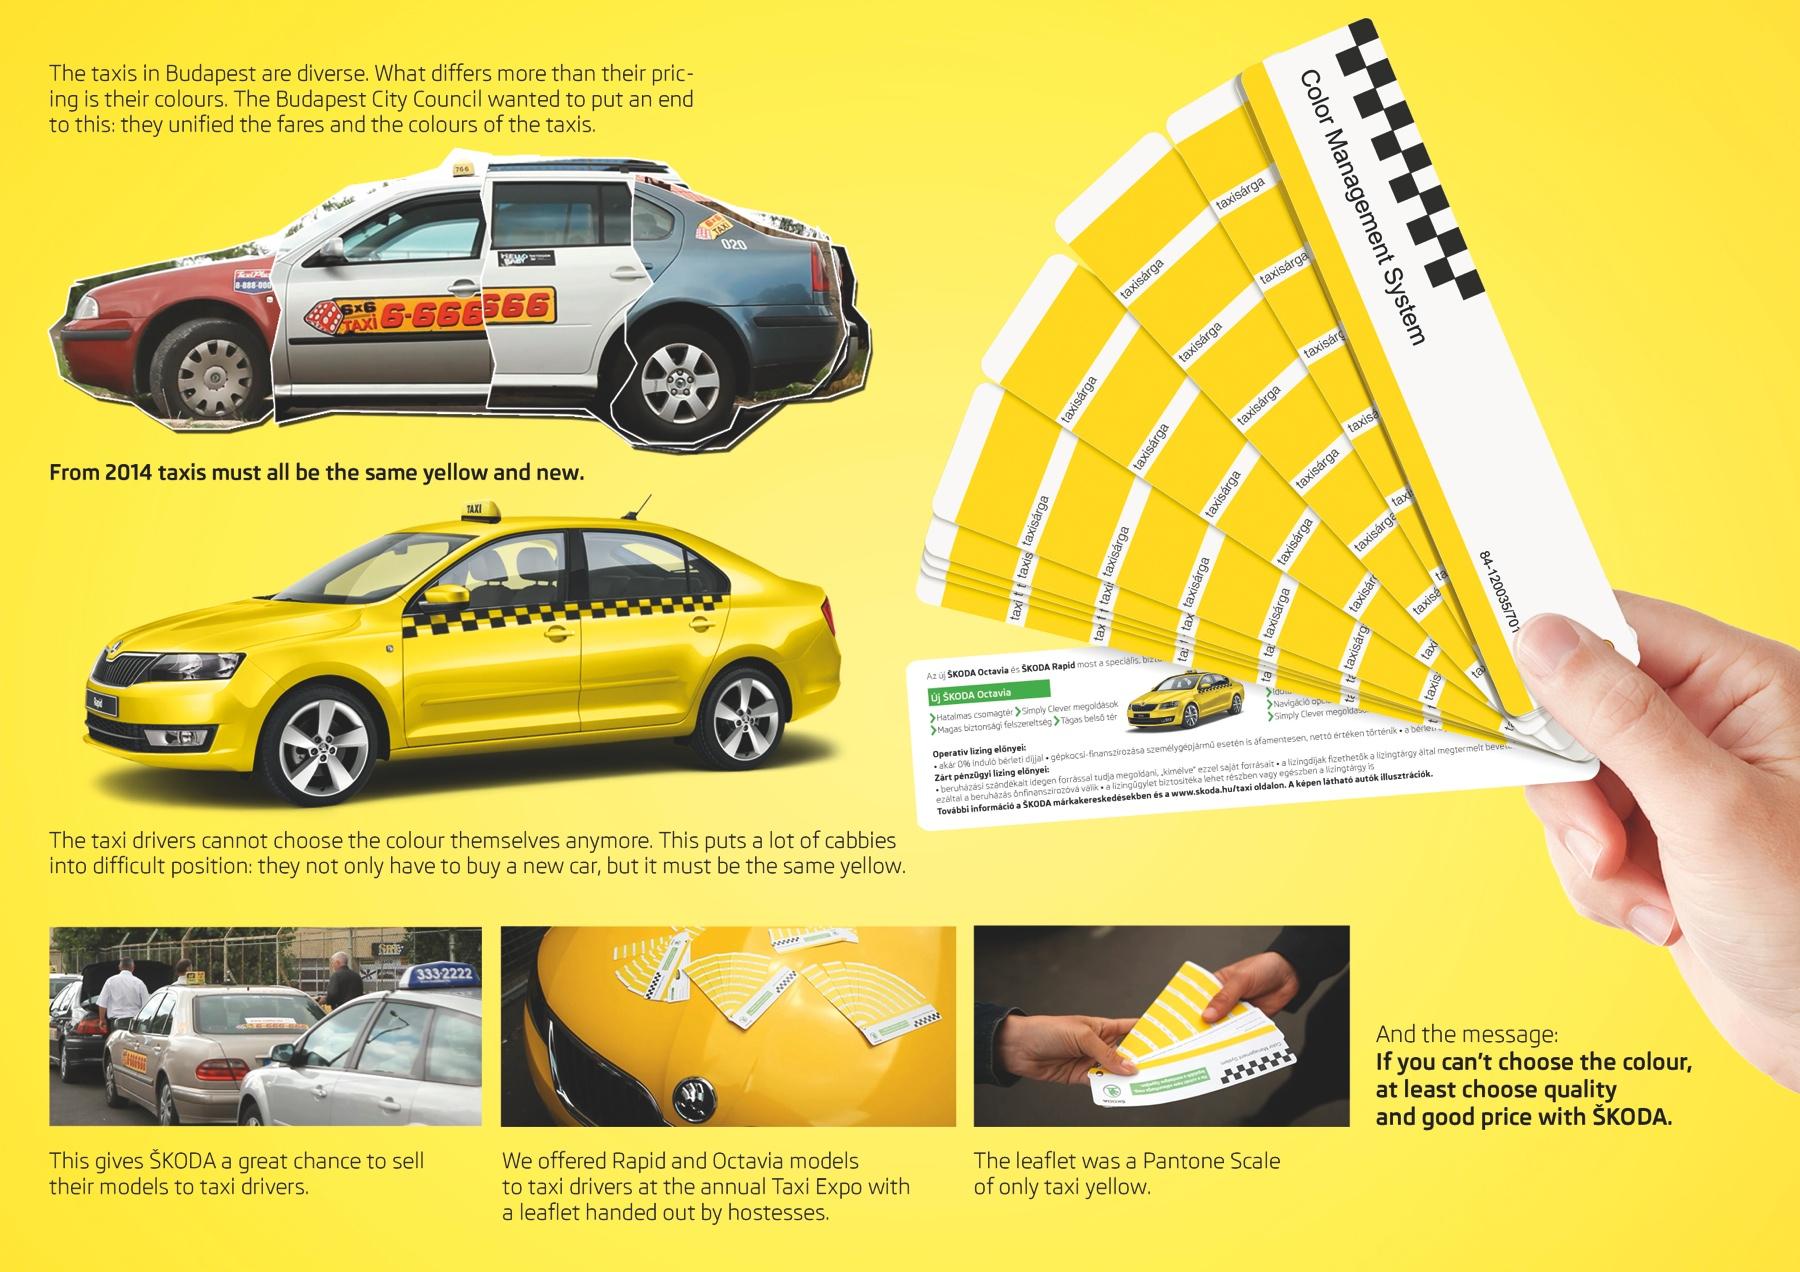 skoda_taxi_board_aotw